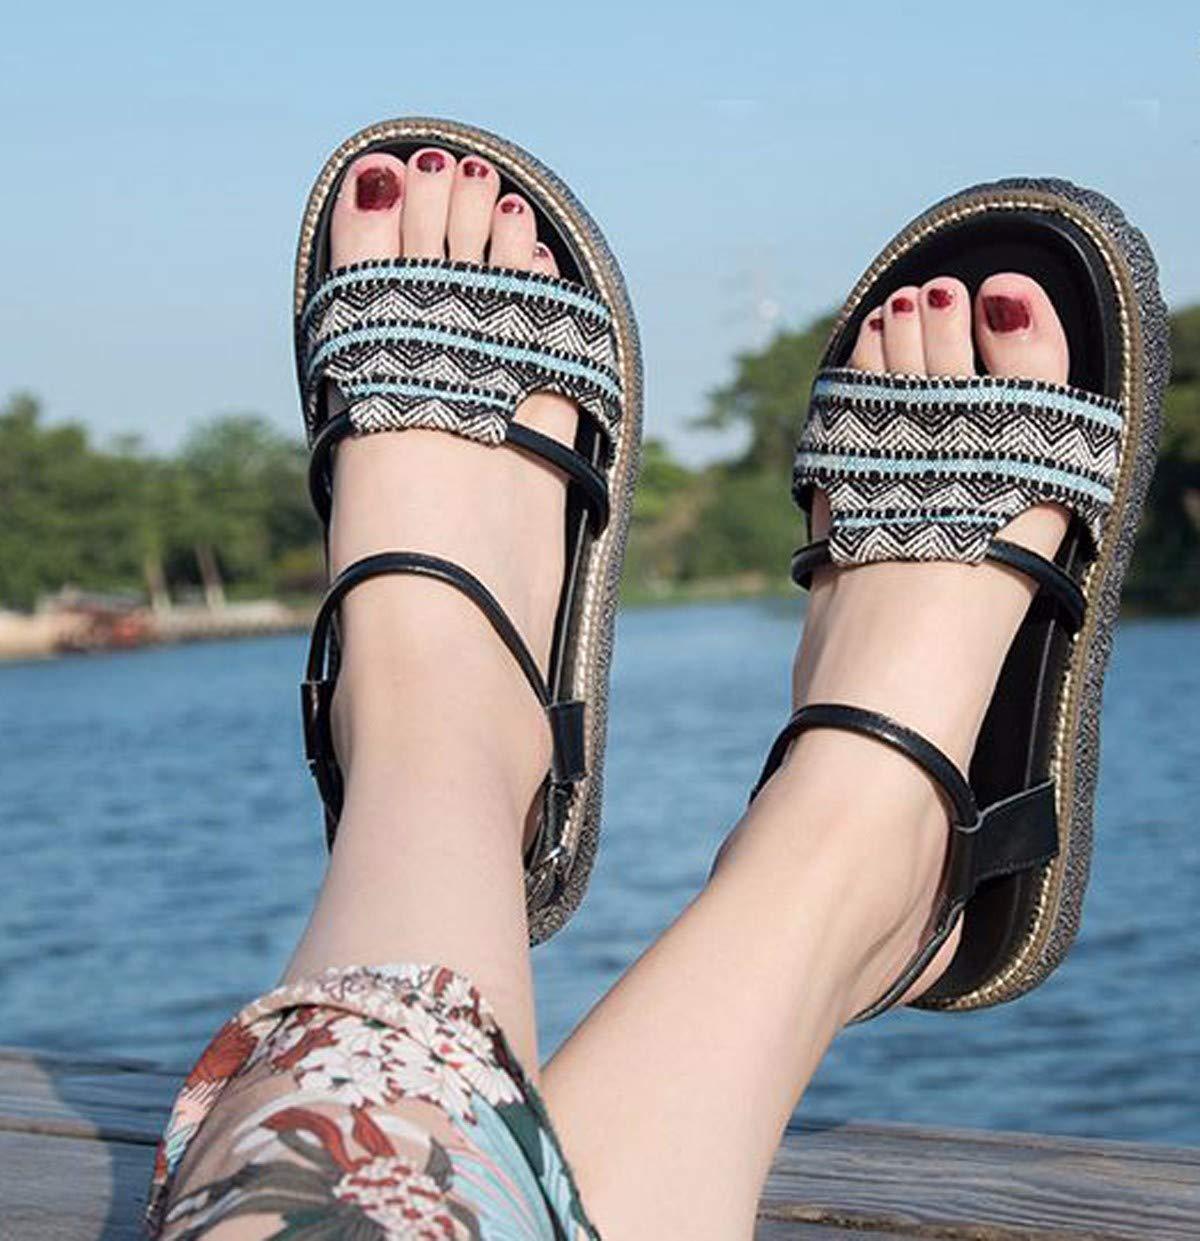 KPHY-Sandalen KPHY-Sandalen KPHY-Sandalen Mode Damenschuhe Drag Retro - Schuhe Flachen Boden - Schuhe.34 Schwarz - cdf76b